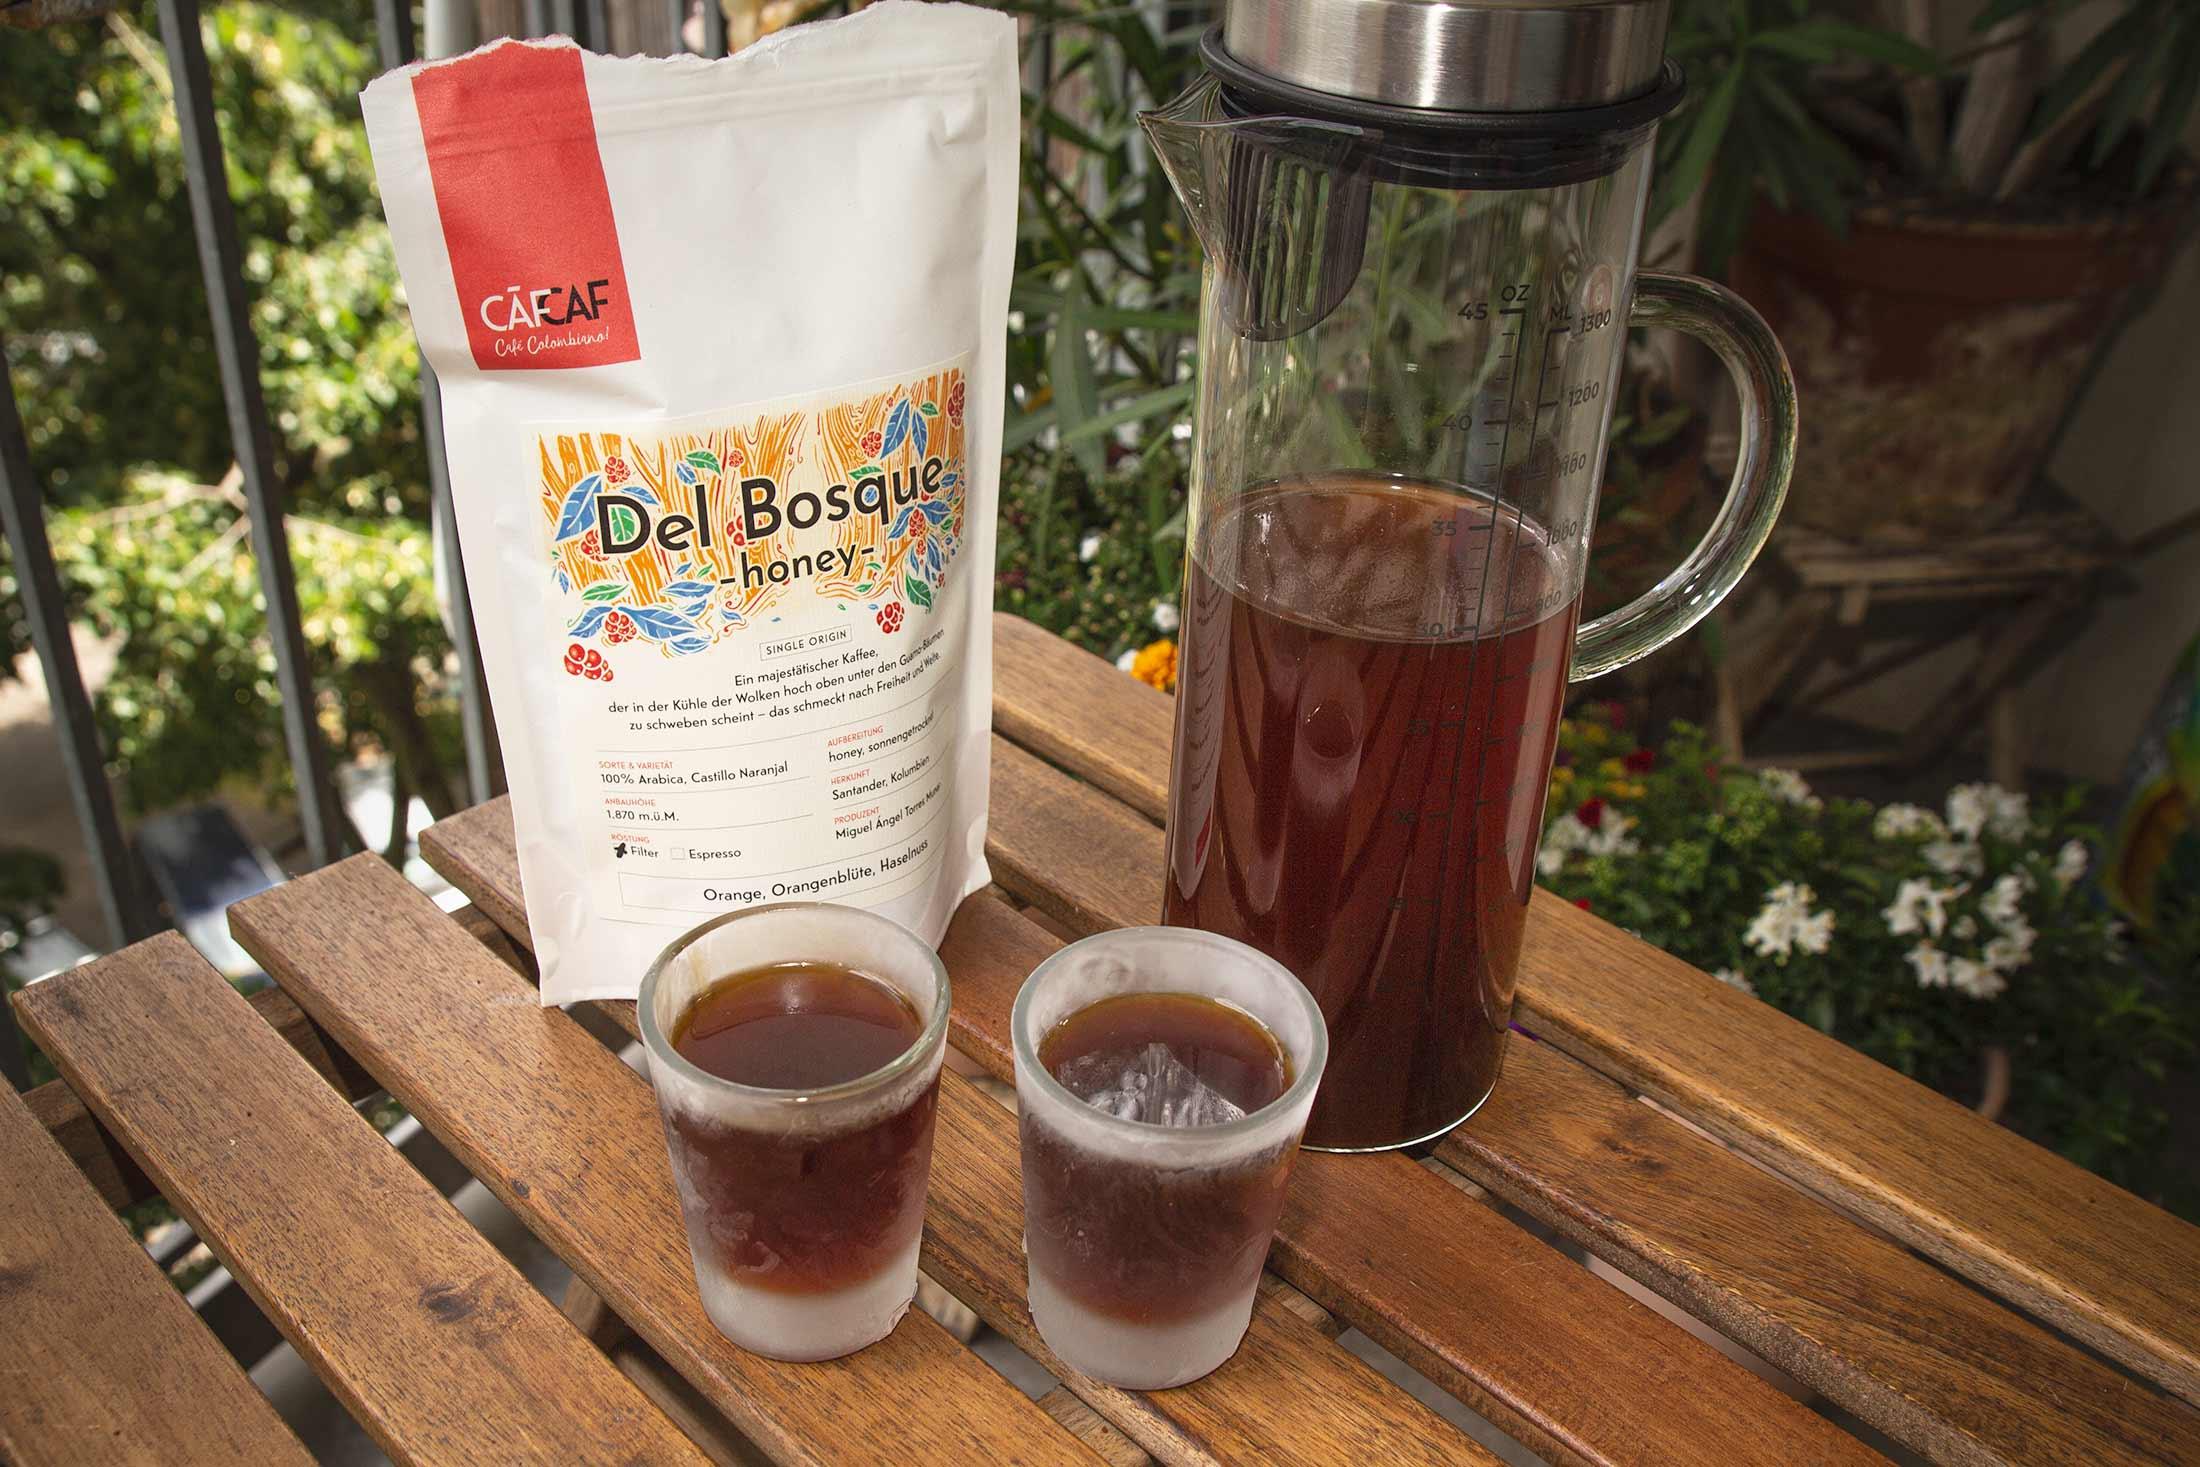 CafCaf Cold Brew Zubereitung Anleitung, selbst gemacht Zuhause